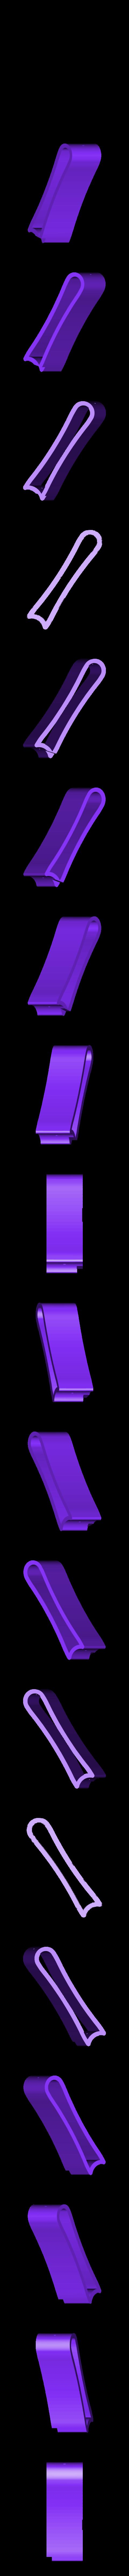 C8_X1.stl Download STL file Adjustable lamp - with vertebrae  • 3D printable object, Ciokobango